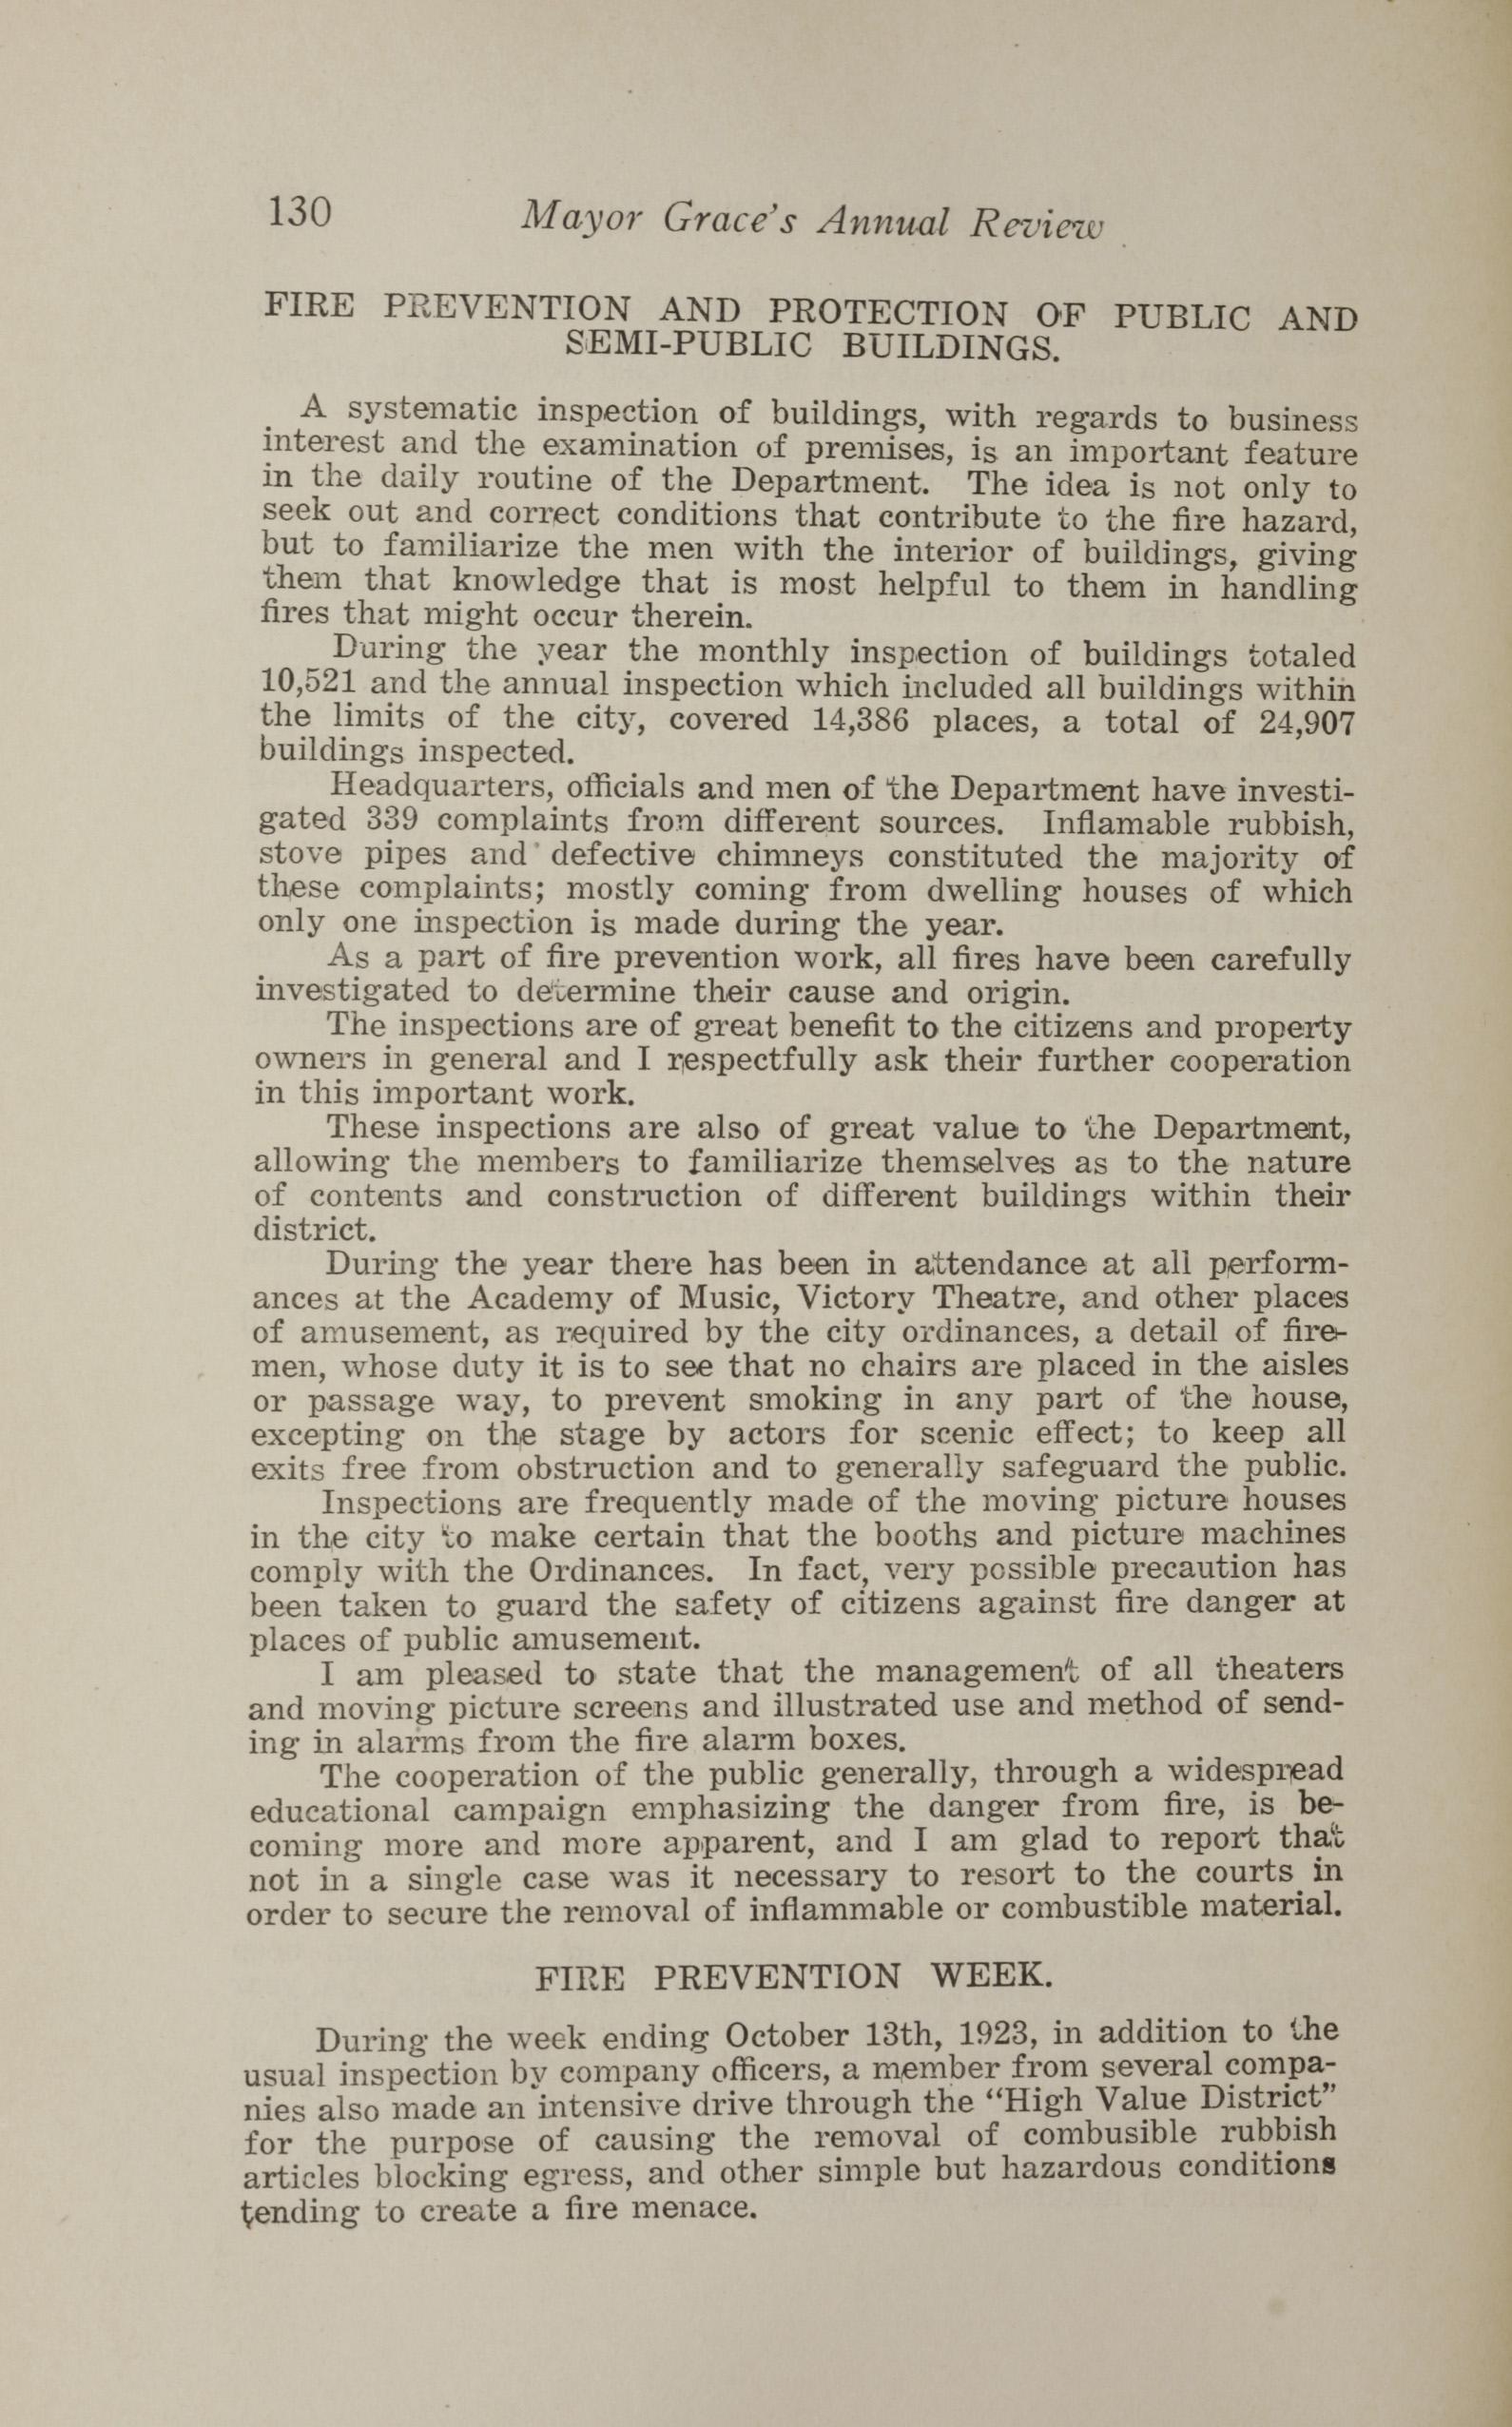 Charleston Yearbook, 1923, page 130